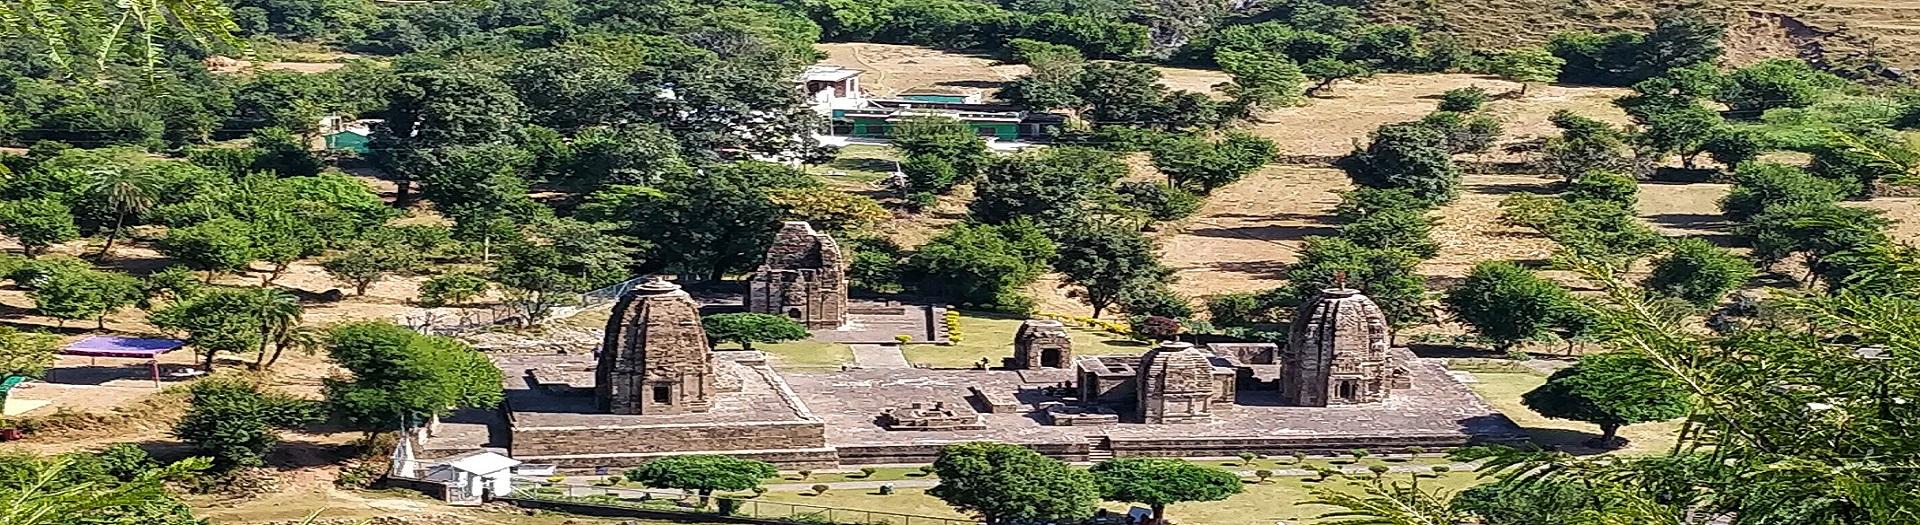 Krimachi Temples Udhampur